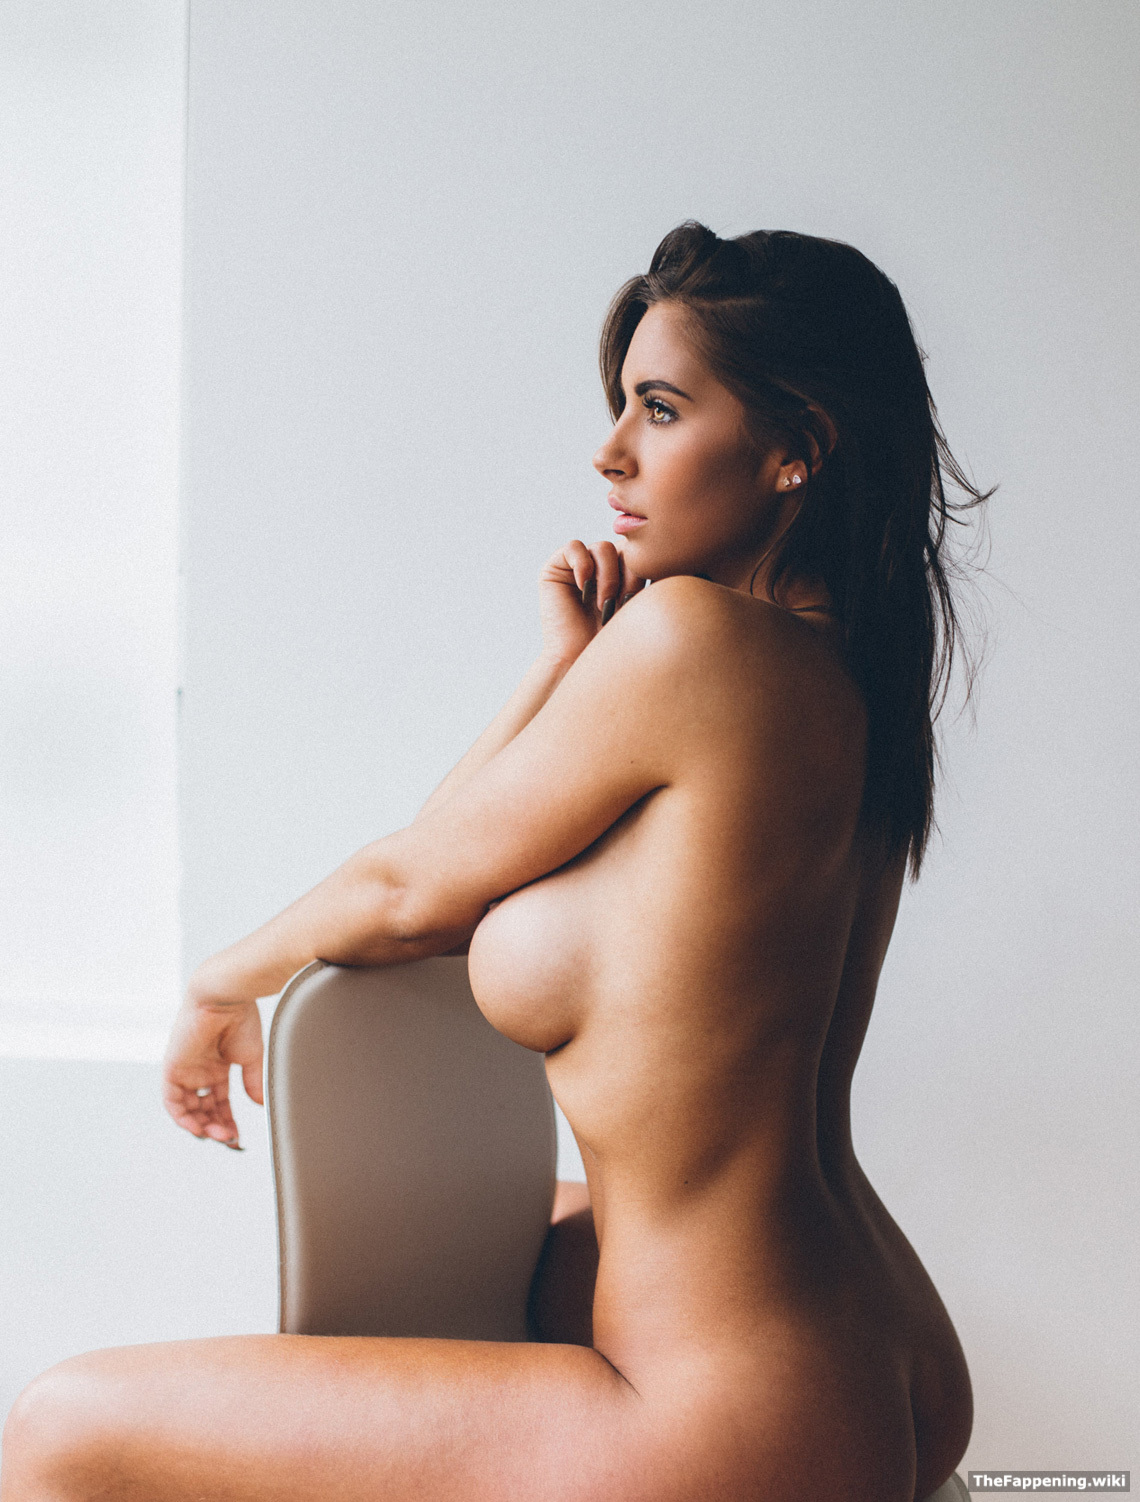 nude pussy pics of monica bedi